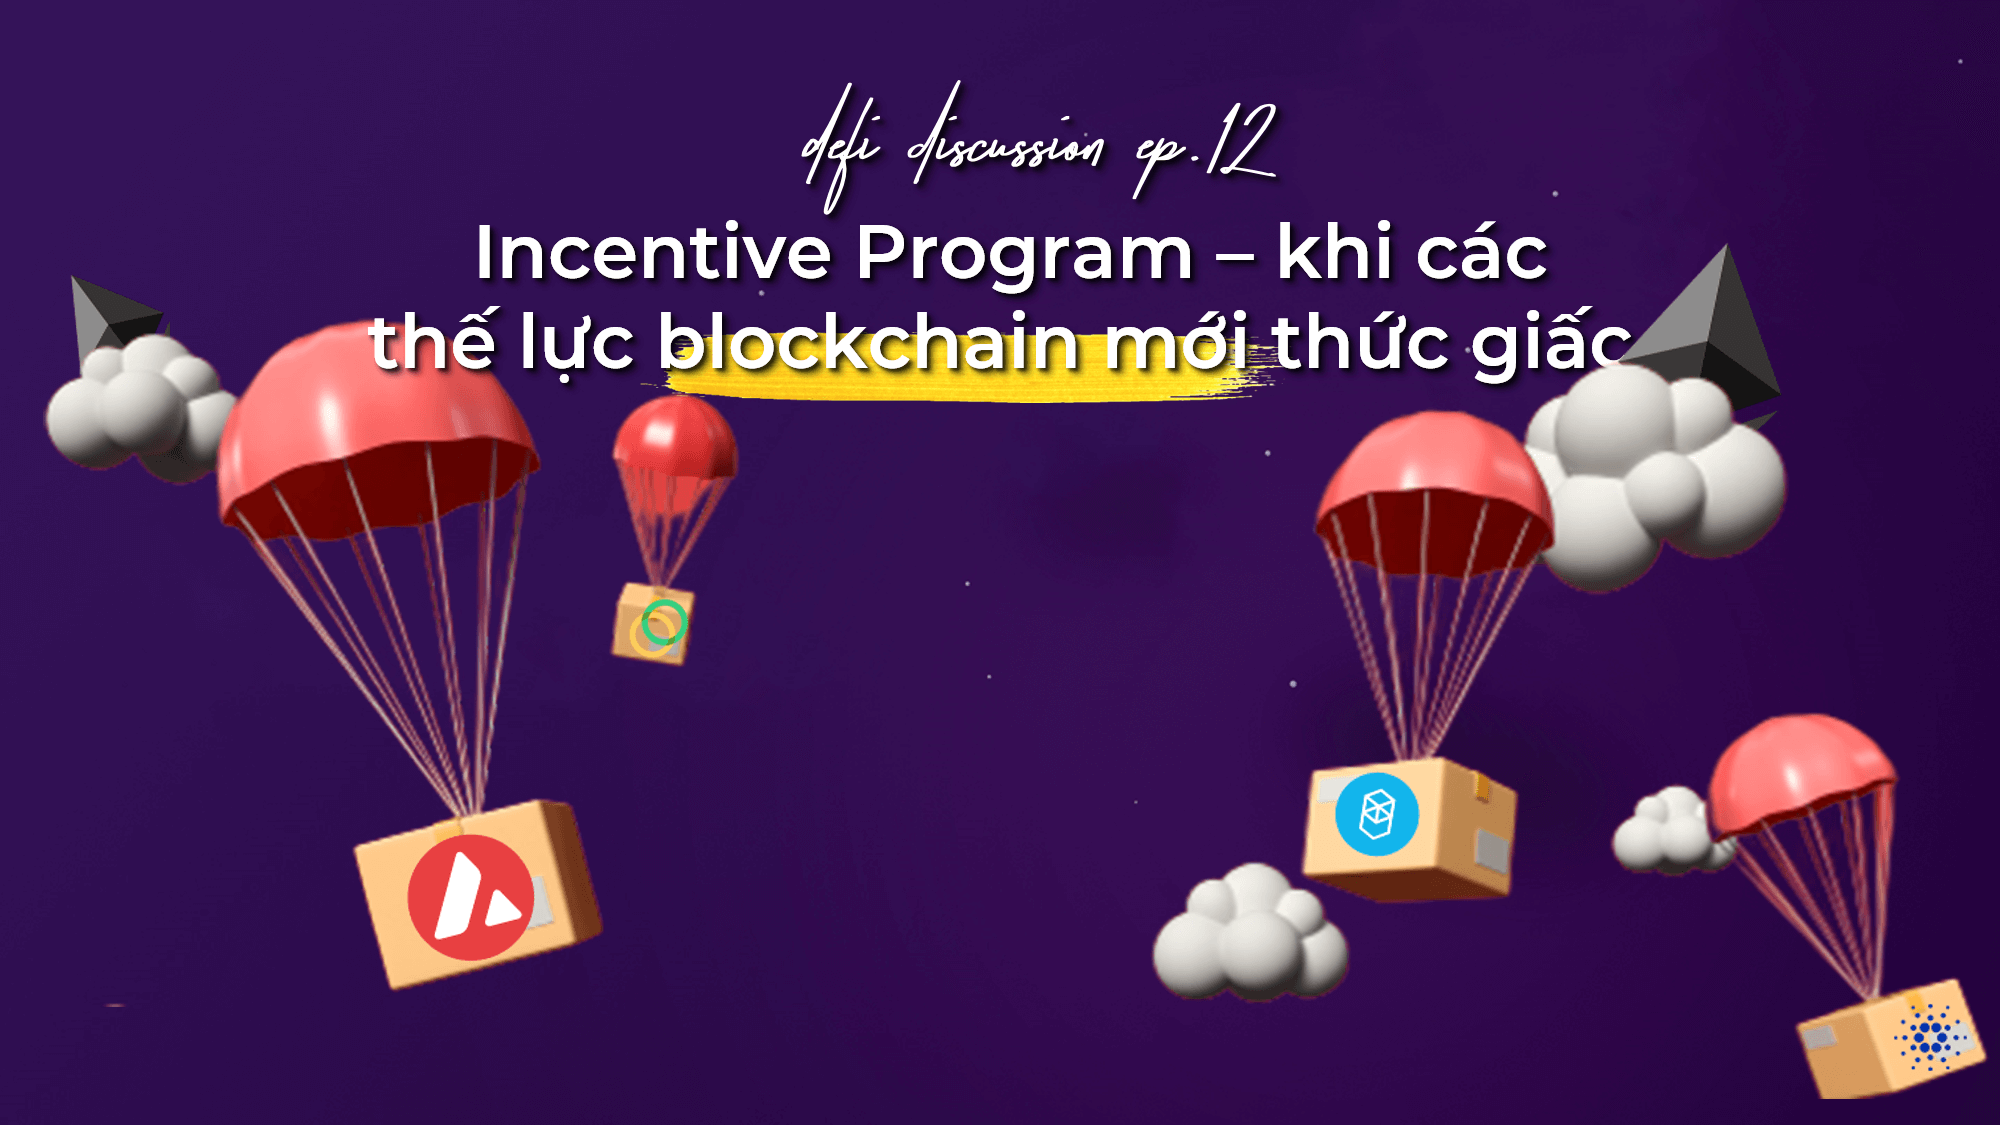 DeFi Discussion ep.12: Incentive Program – khi các thế lực blockchain mới thức giấc